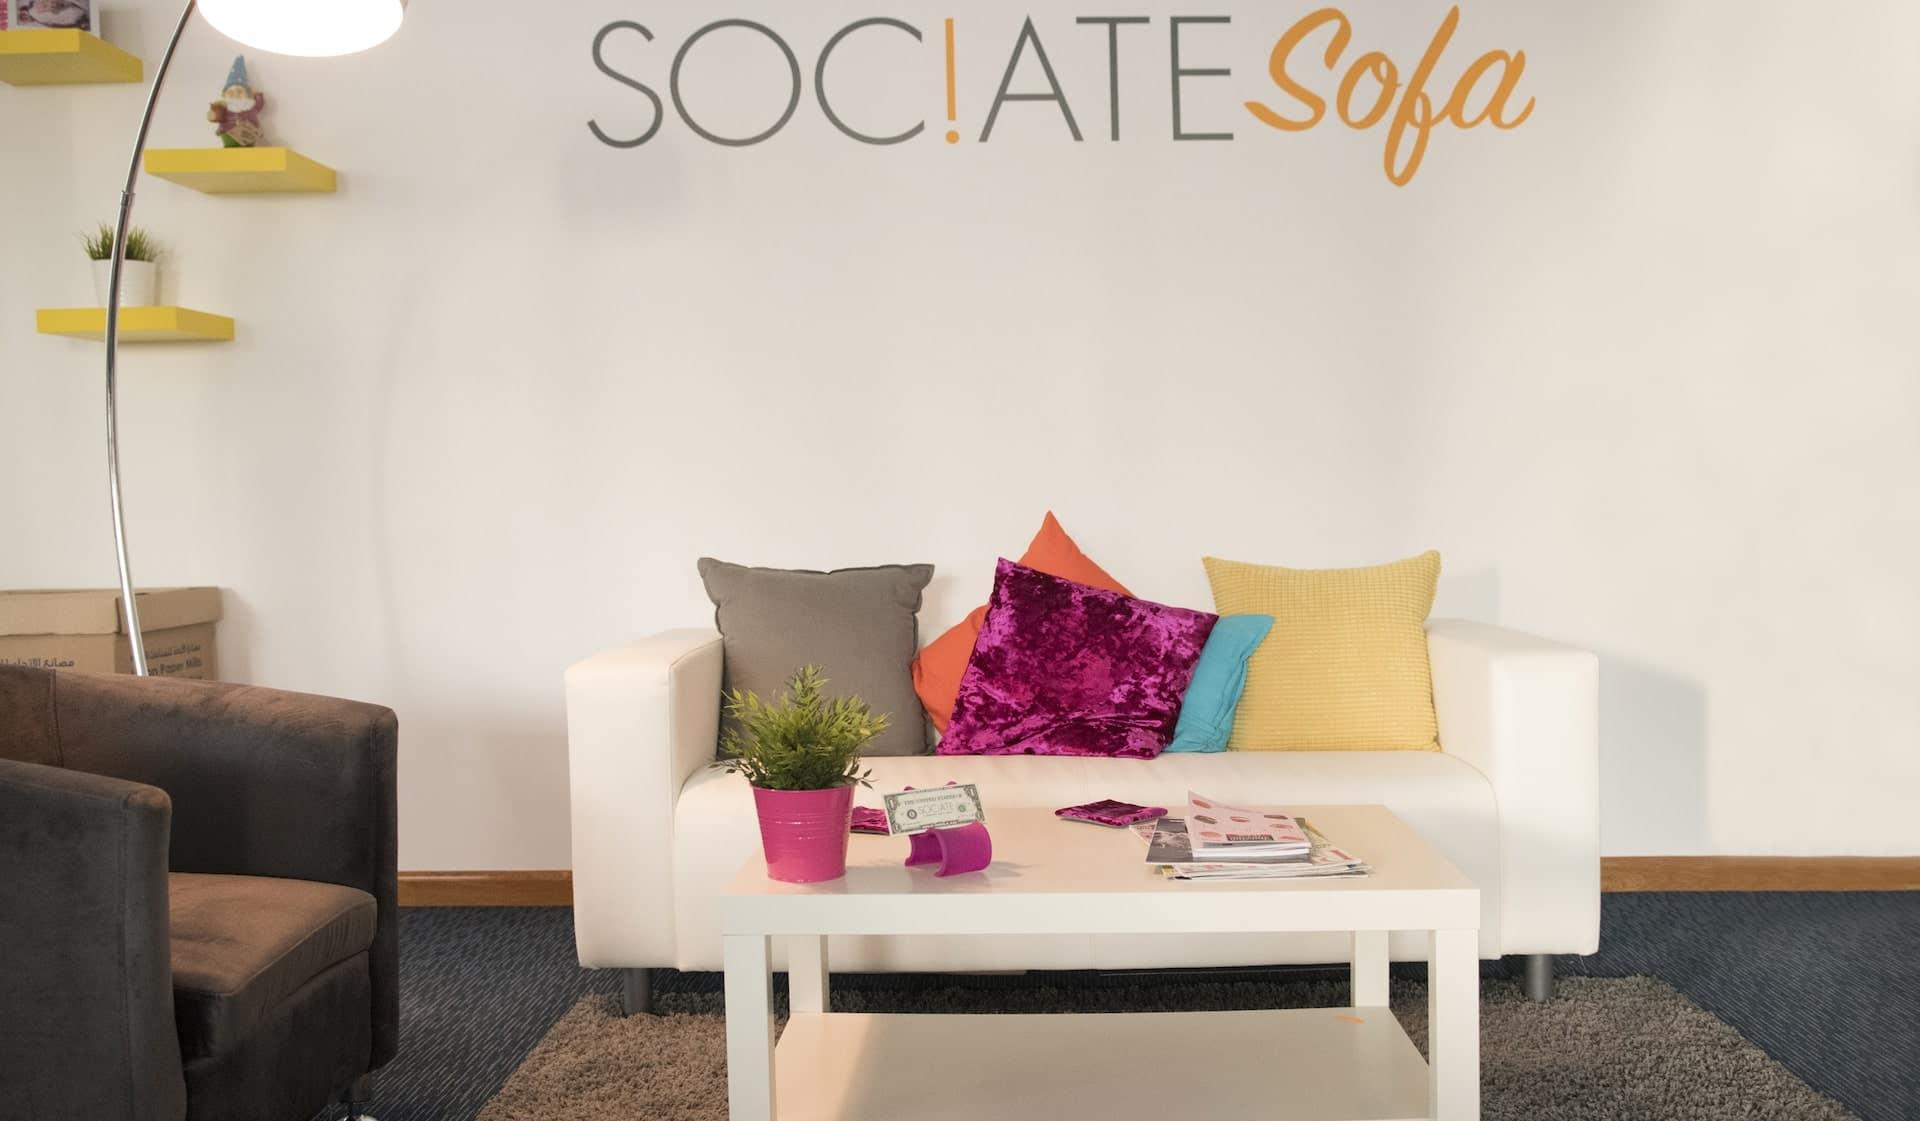 sociate sofa updates